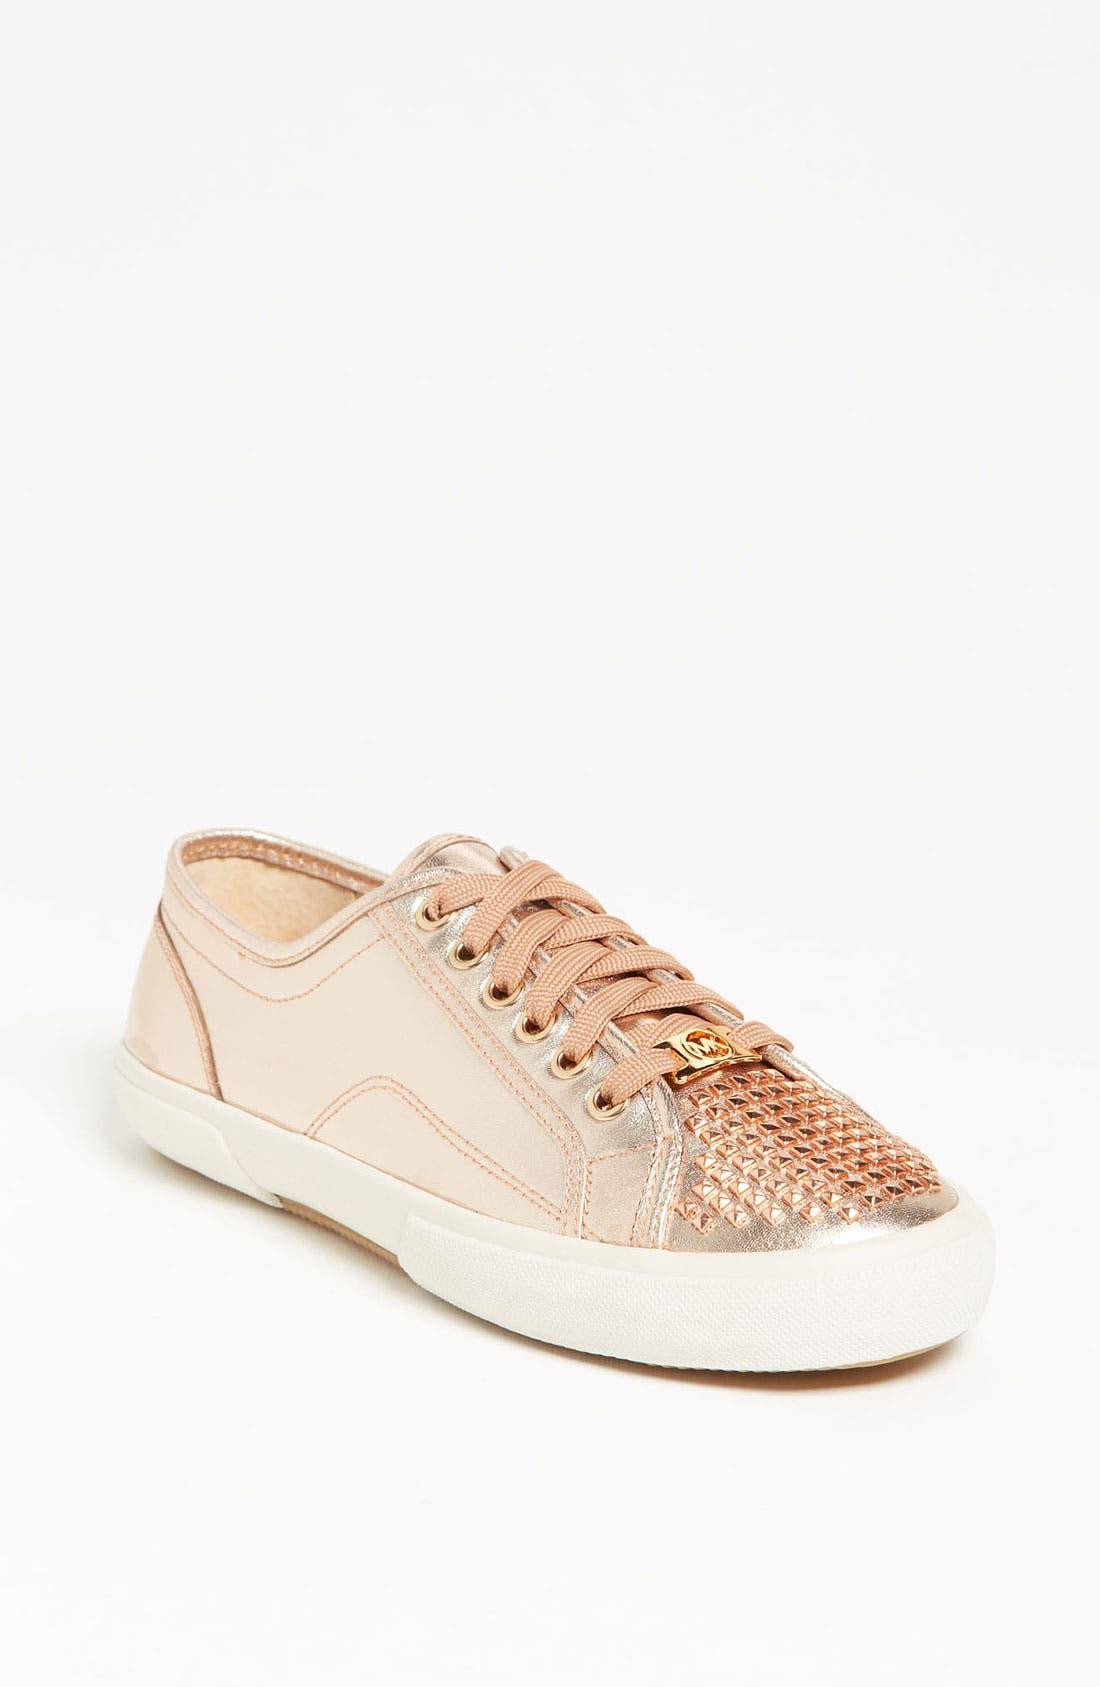 Main Image - MICHAEL Michael Kors' Boerum' Studded Sneaker